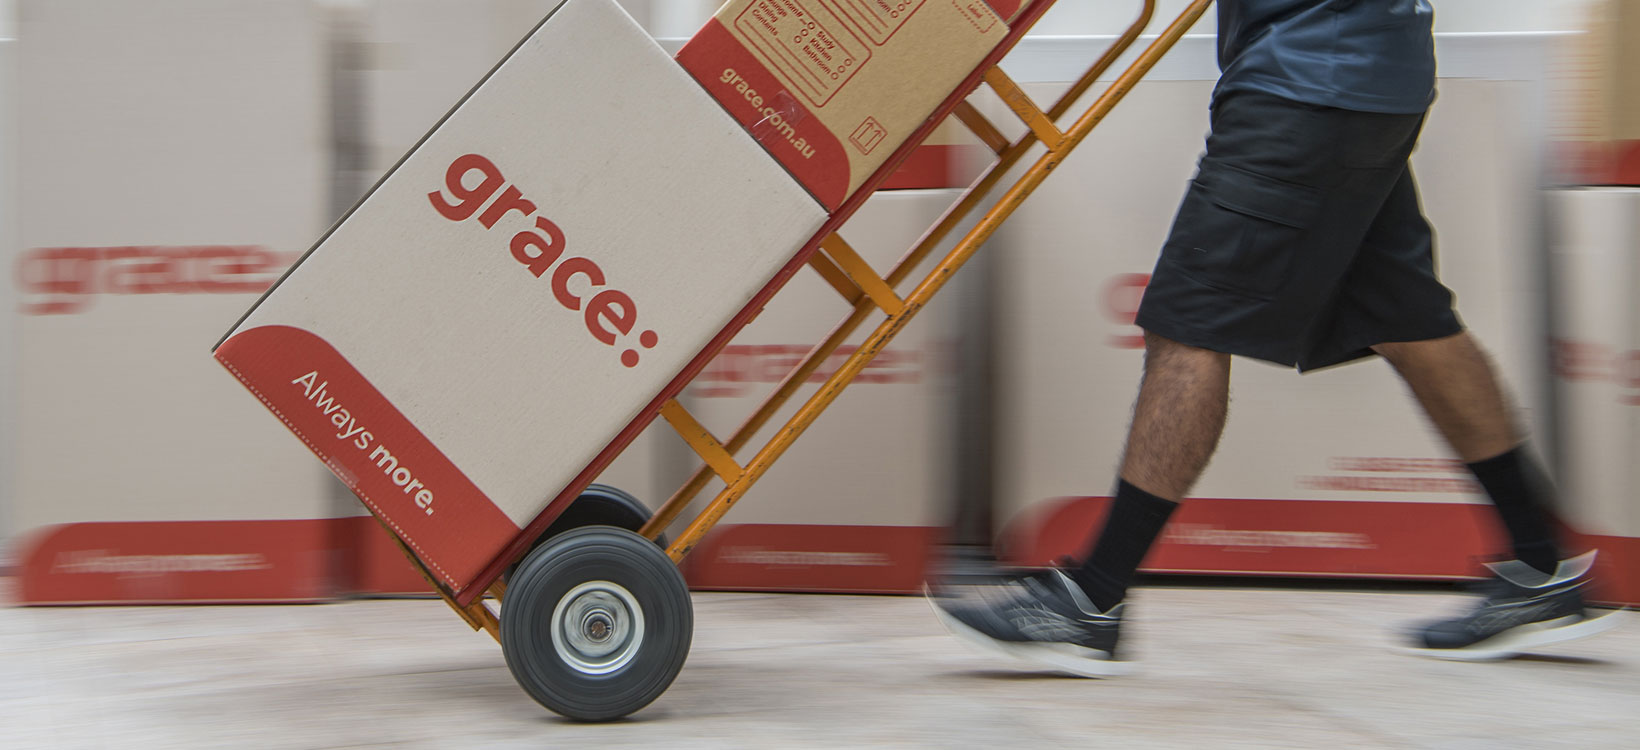 Grace - Always More Rebrand